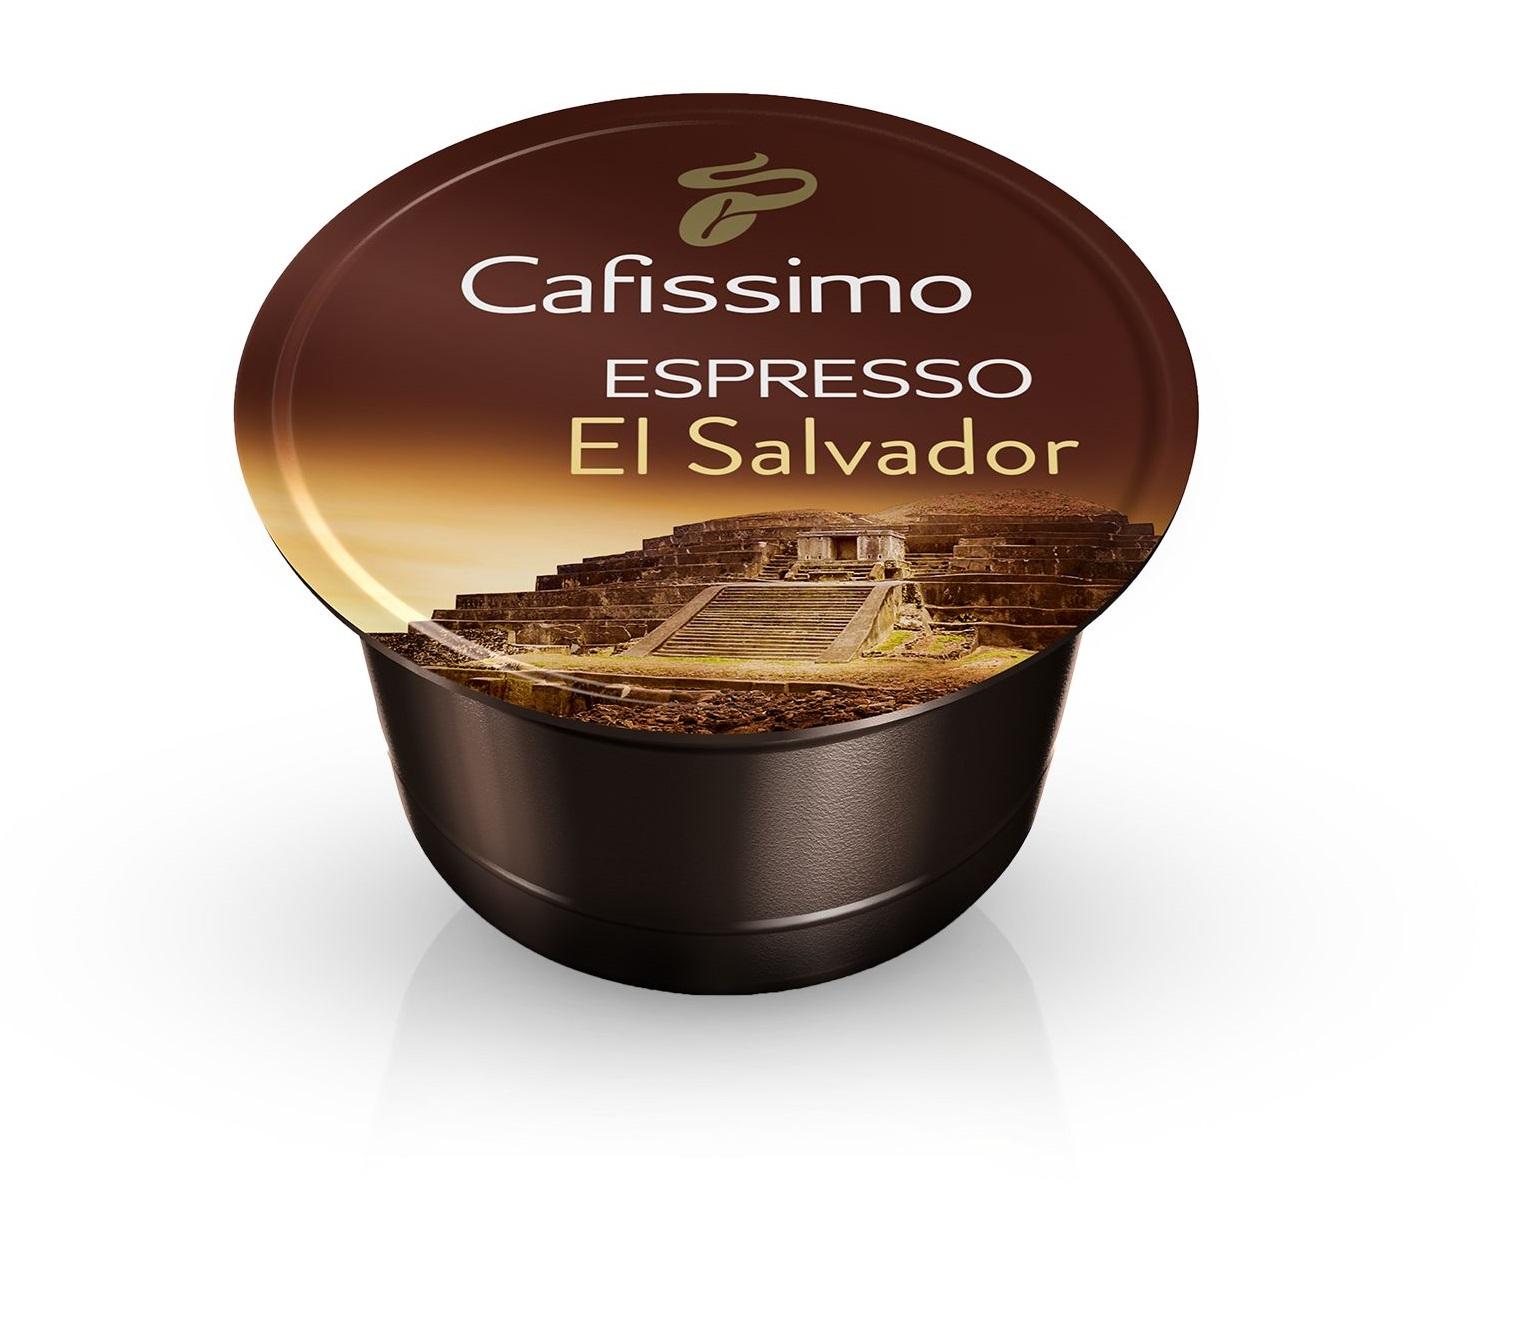 Descriere Capsule cafea, 10 capsule/cutie, Espresso, TCHIBO Cafissimo El Salvador